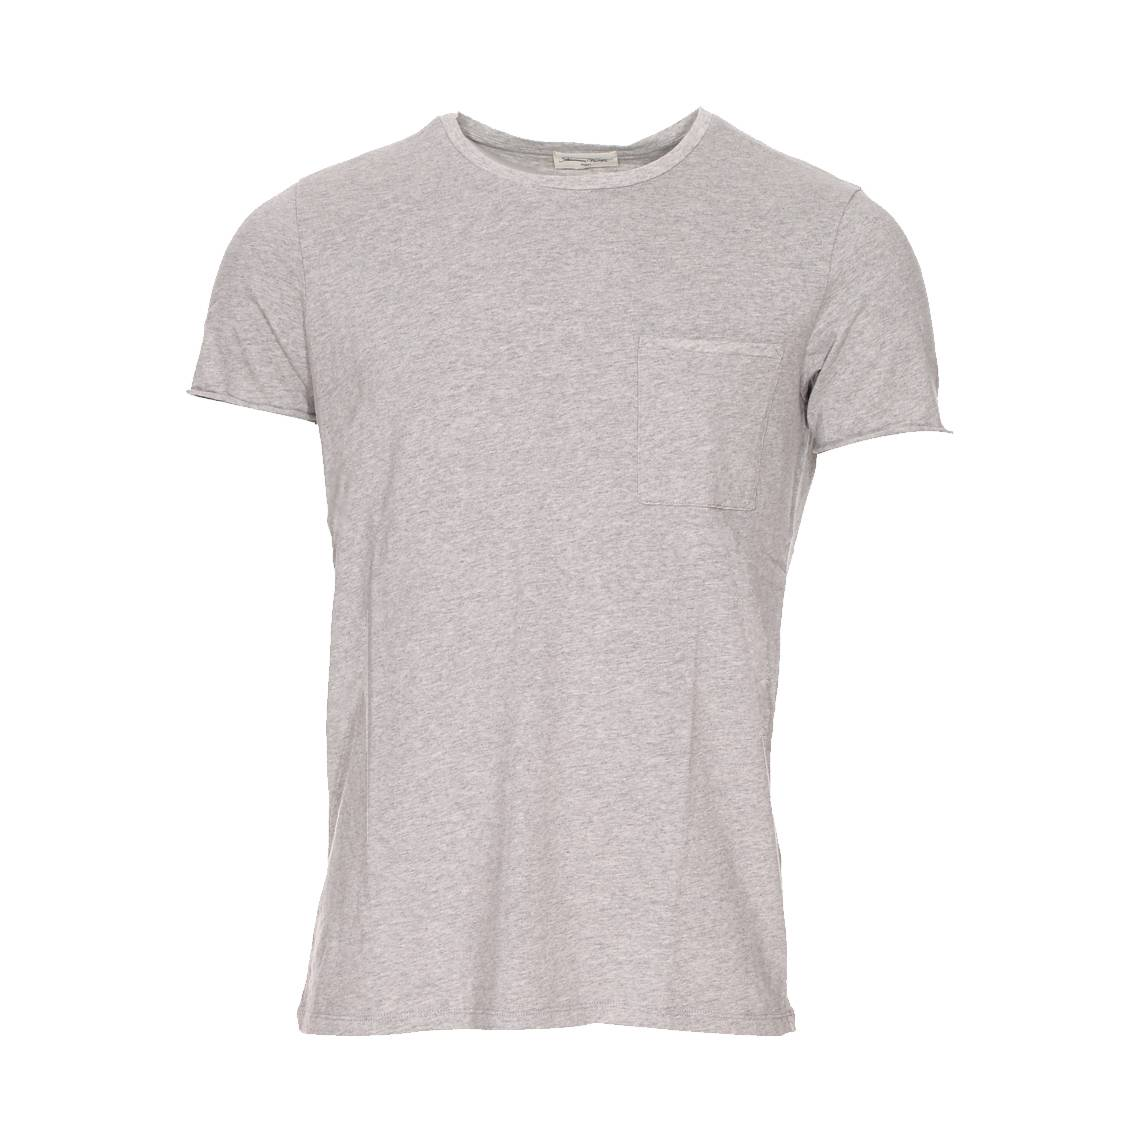 Tee-shirt col rond paxton  en jersey flammé épais gris clair chiné